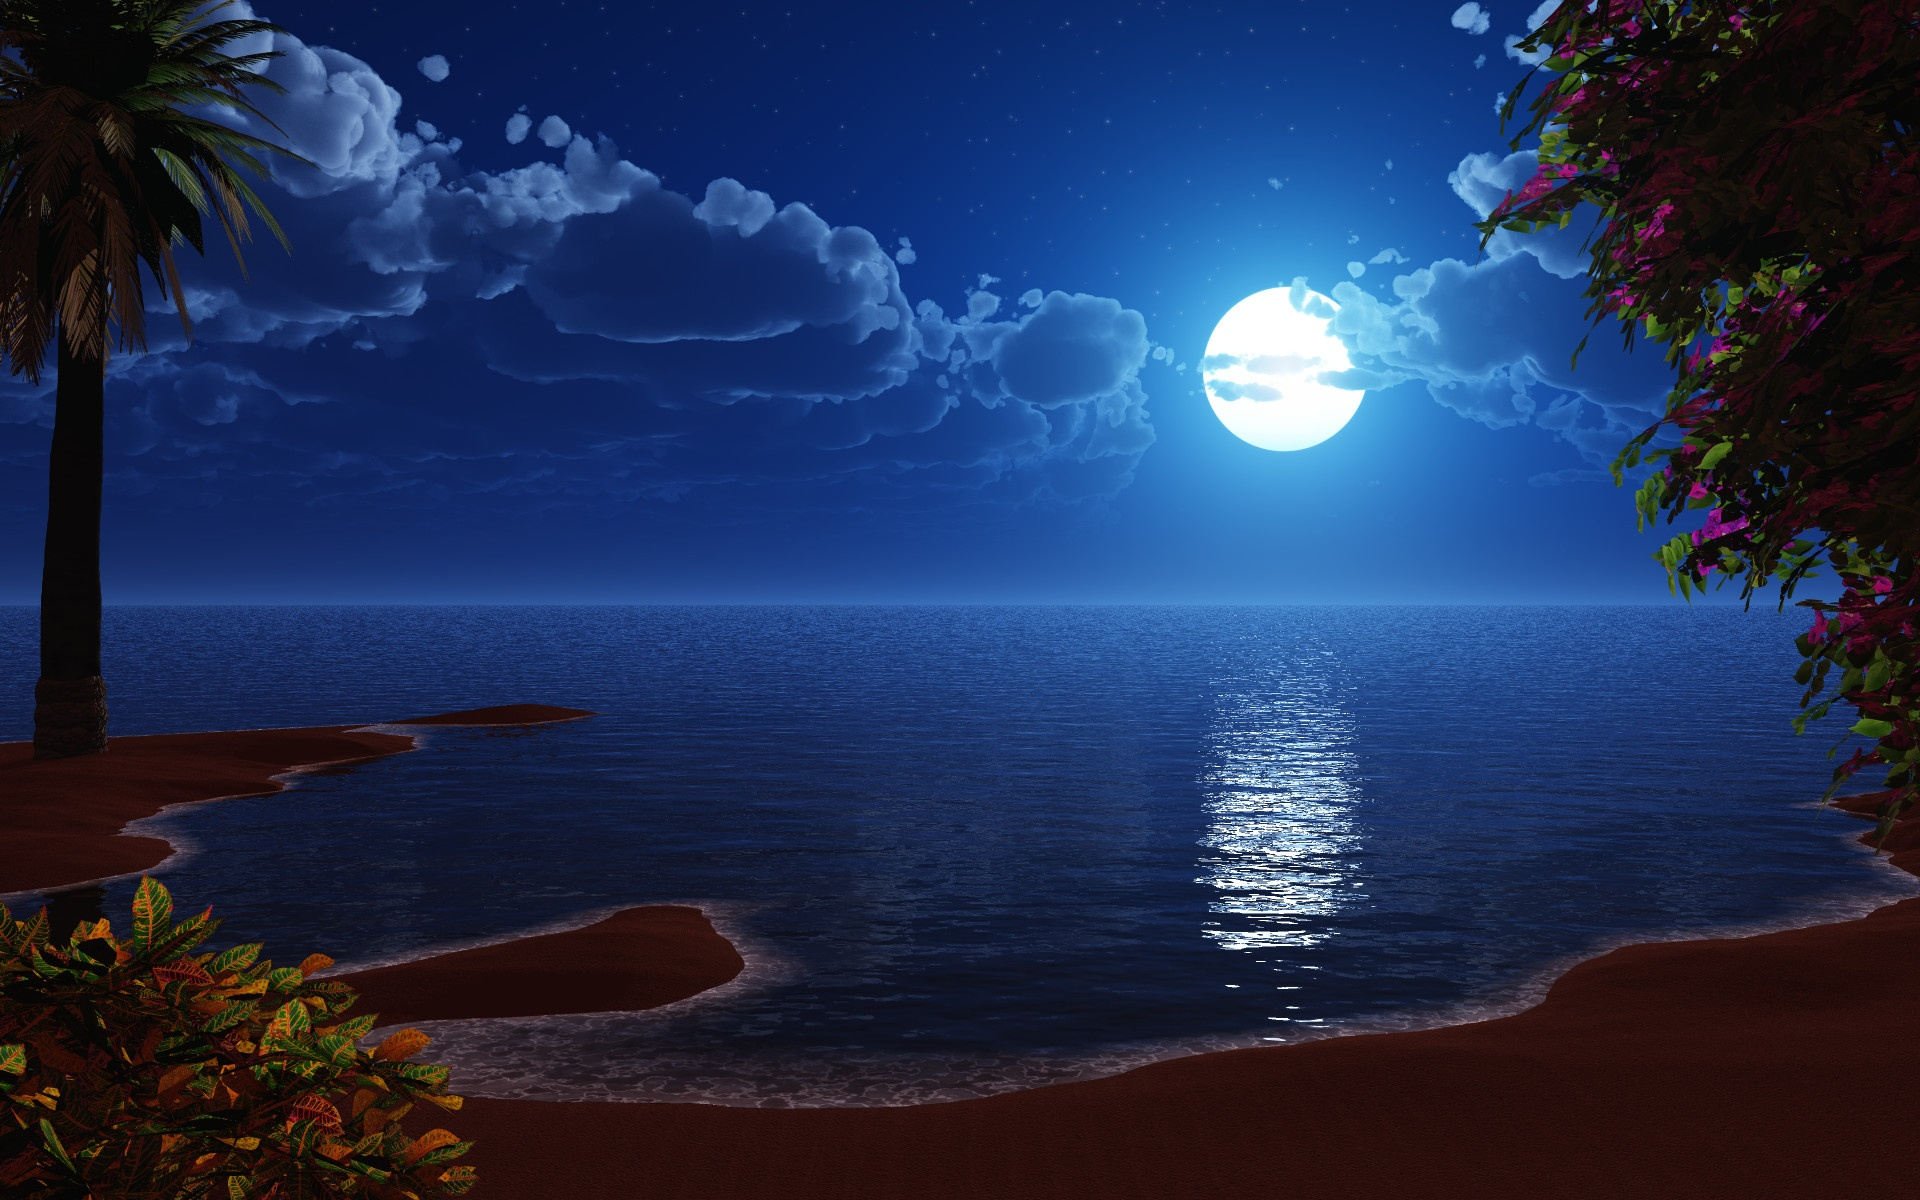 The Night Moon Shining Over The Ocean Shore desktop wallpaper 1920x1200